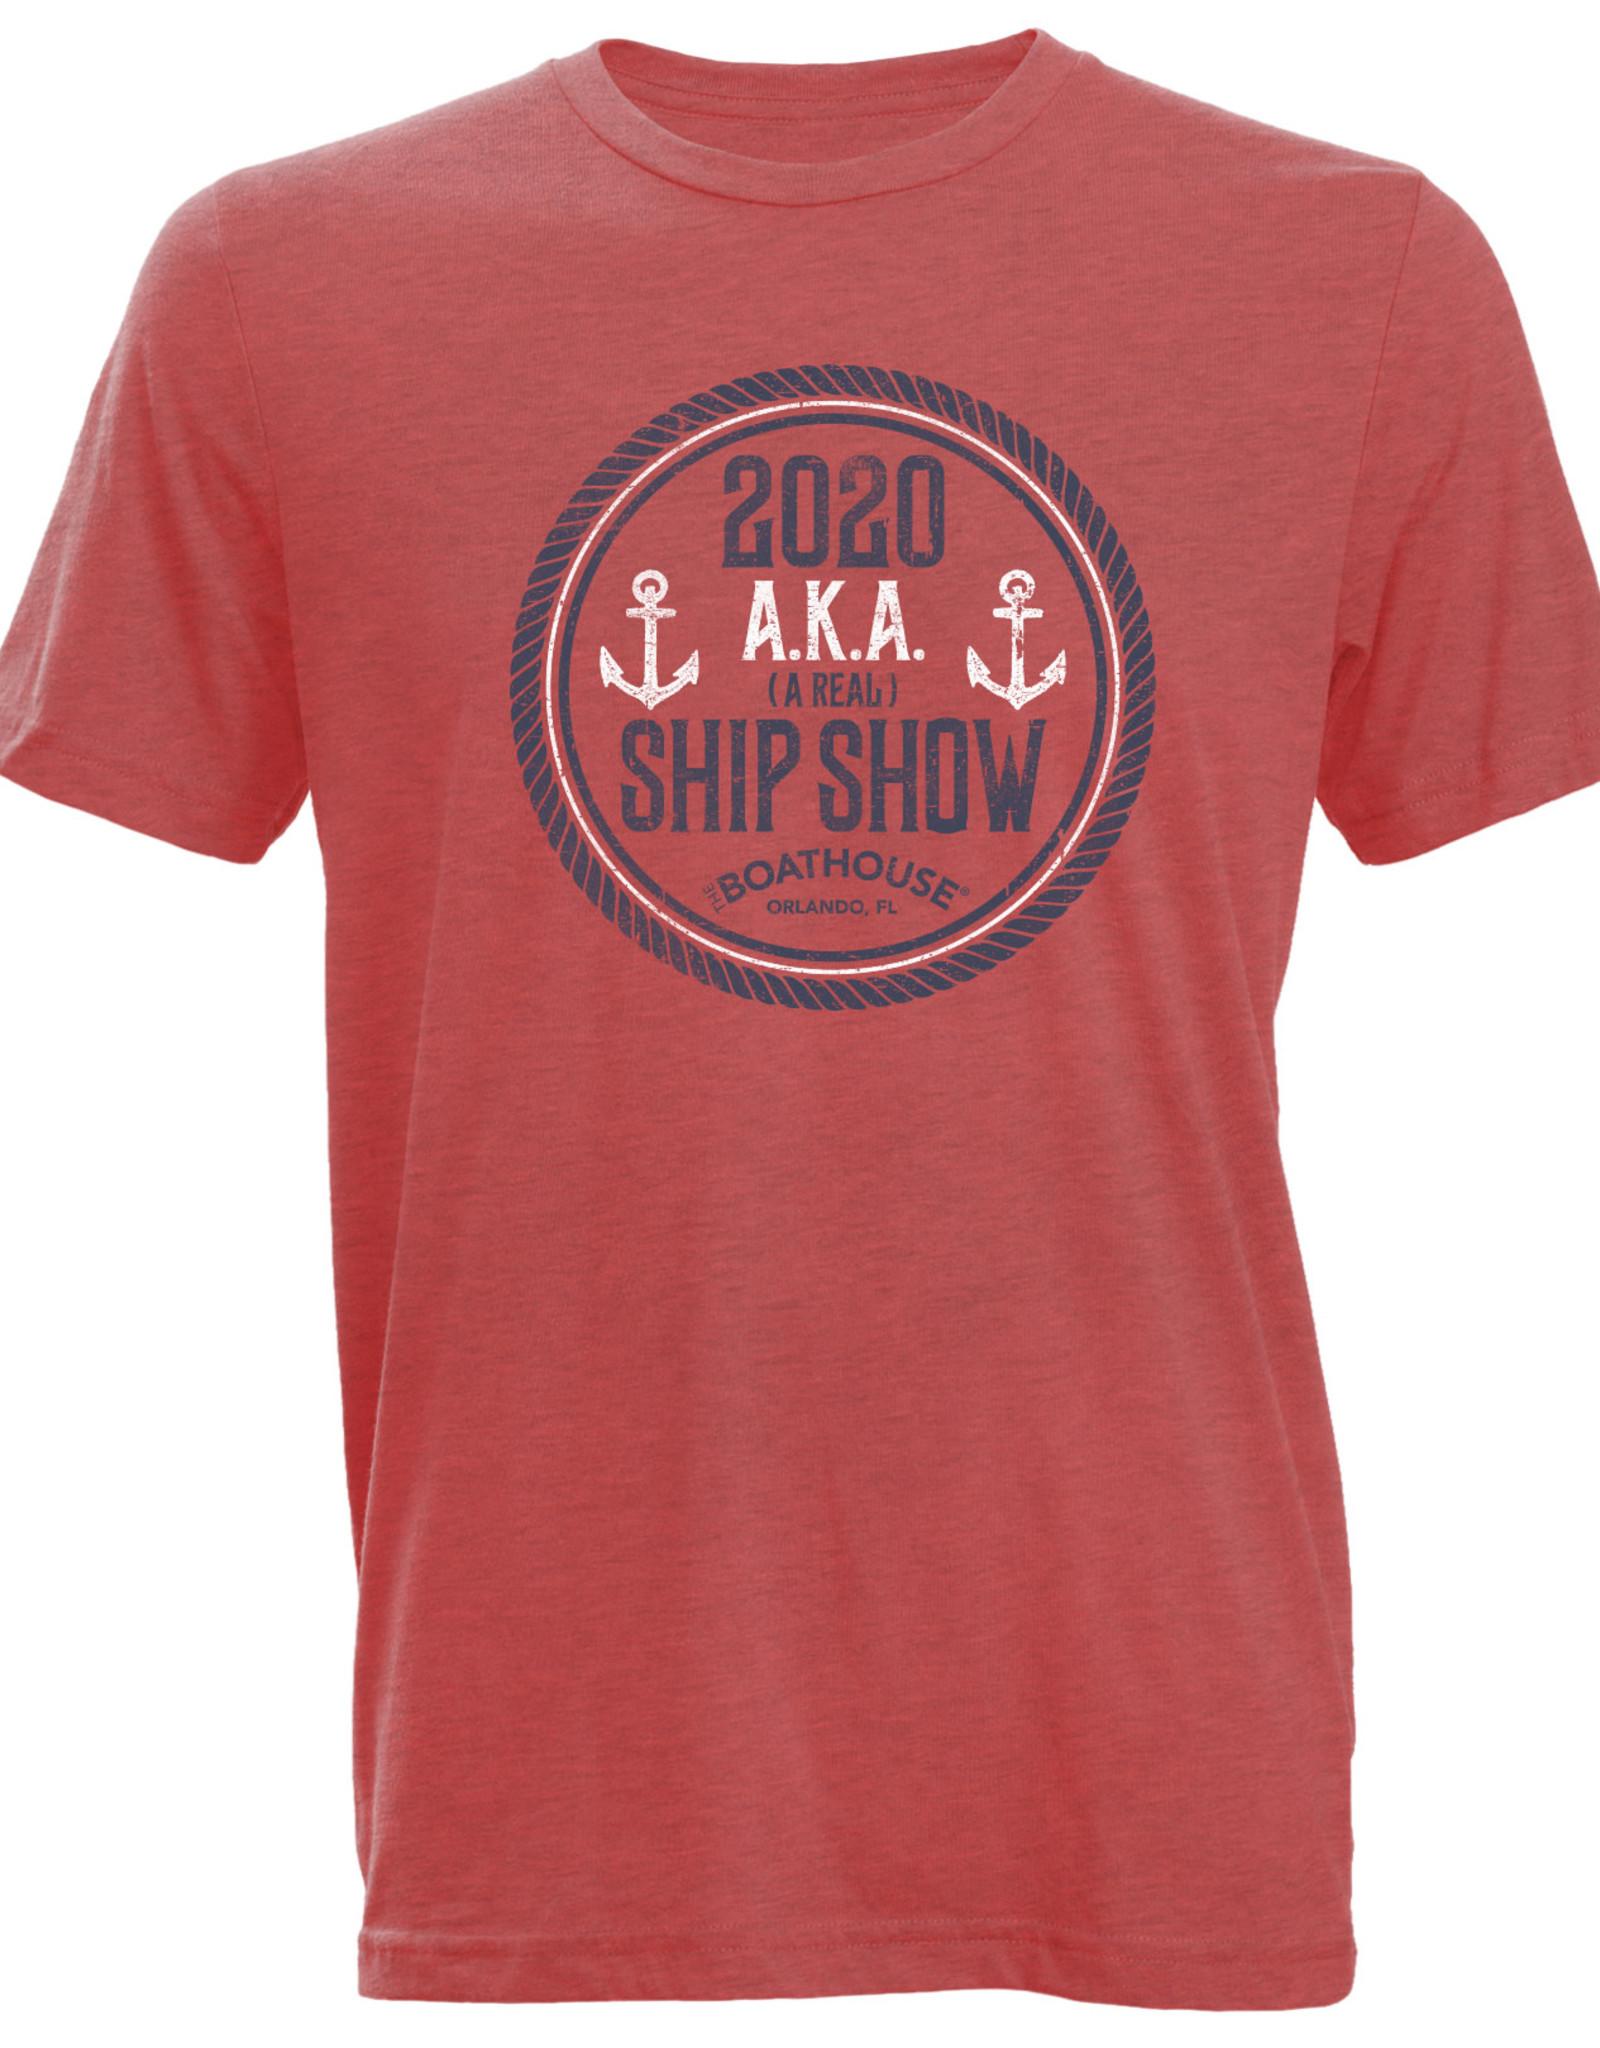 2020 AKA SHIP SHOW SHORT SLEEVE TEE